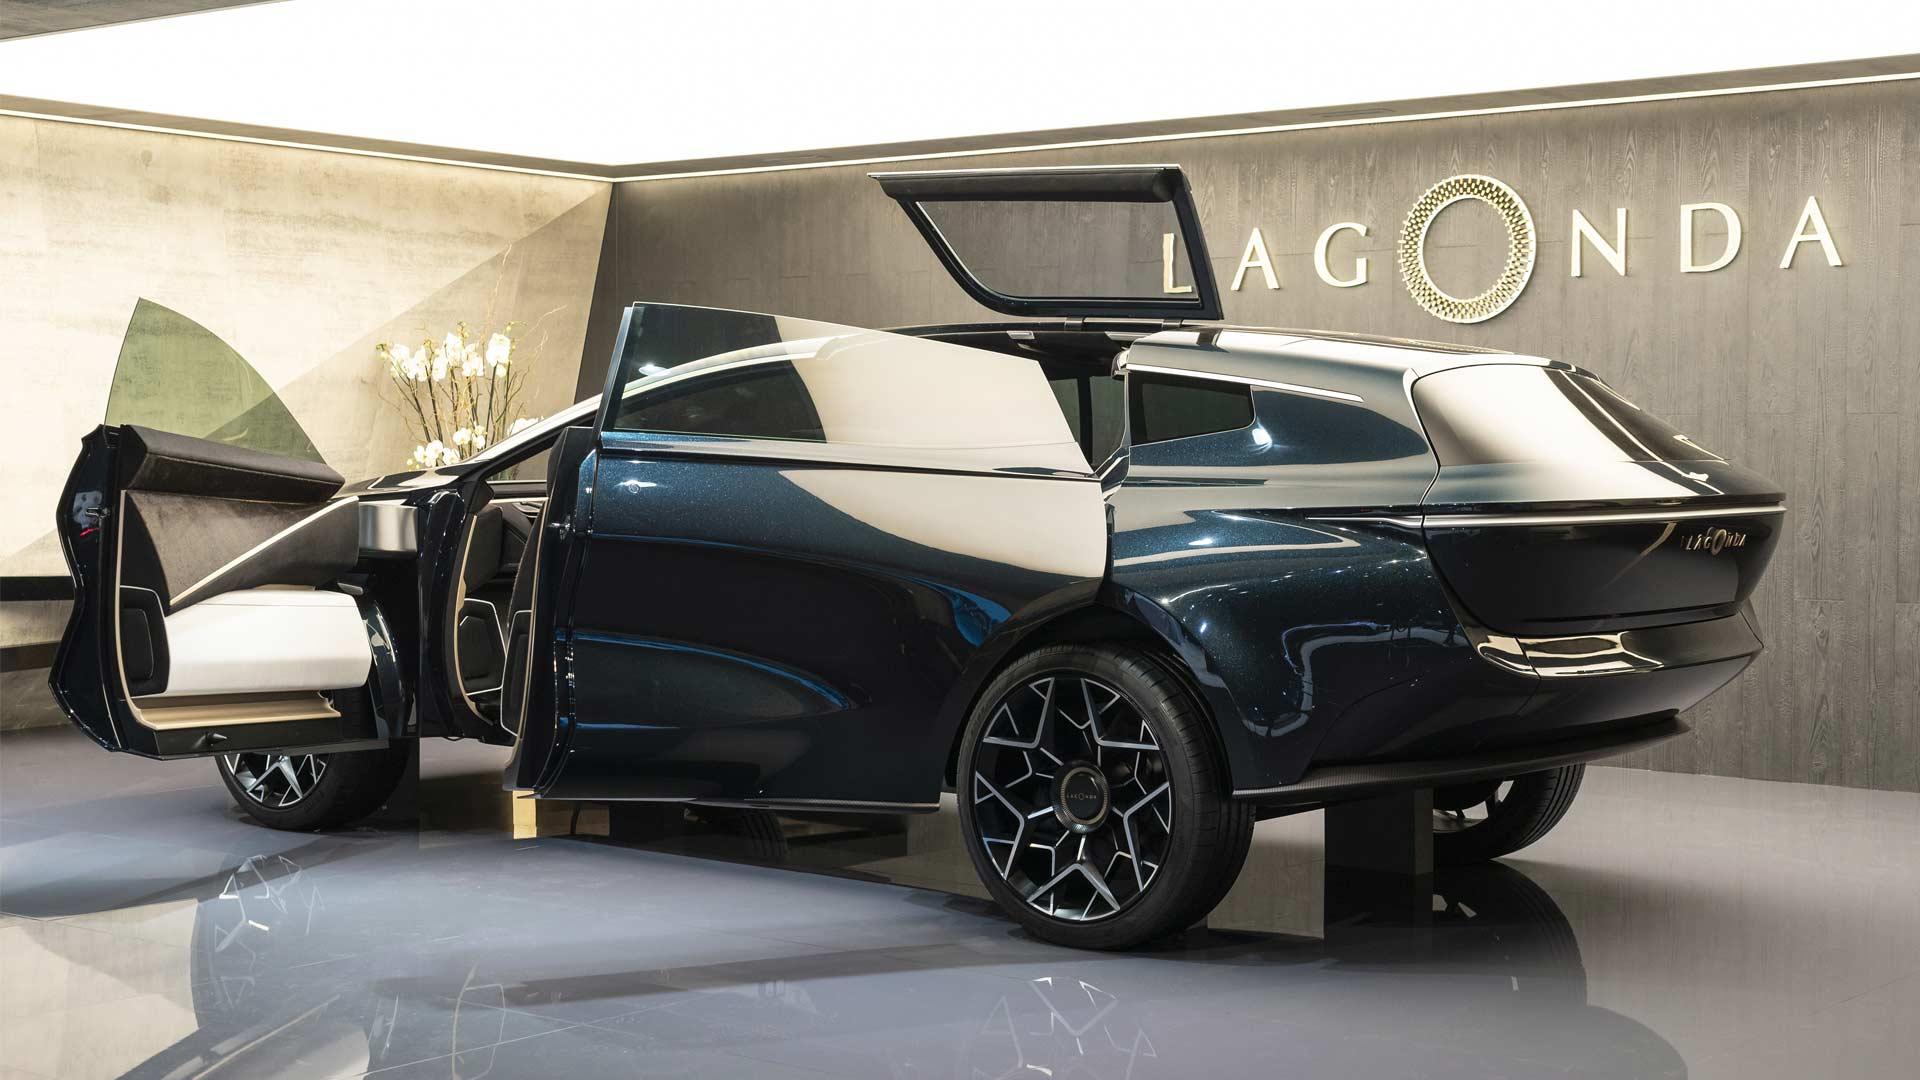 Lagona All Terrain Concept SUV Doors